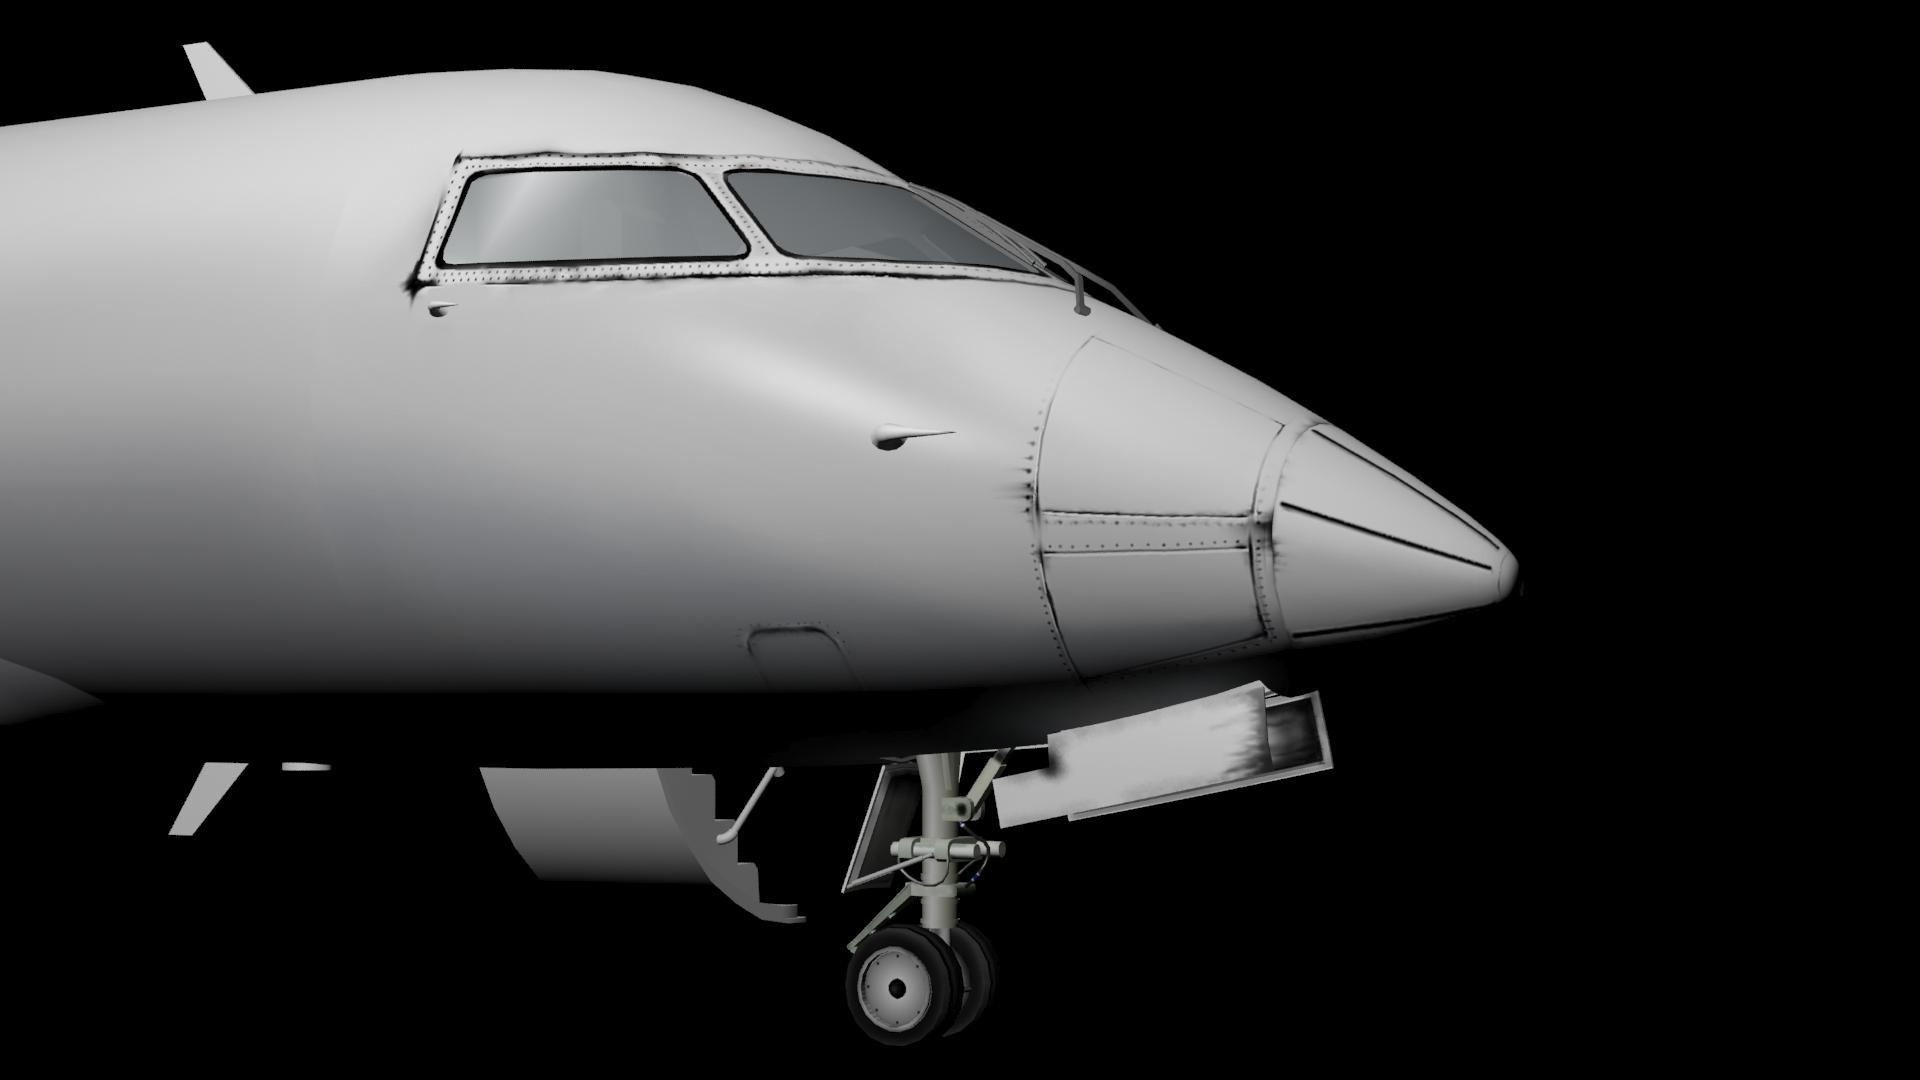 P3D v2 - Bombardier Challenger 605 | Page 2 | FSDeveloper